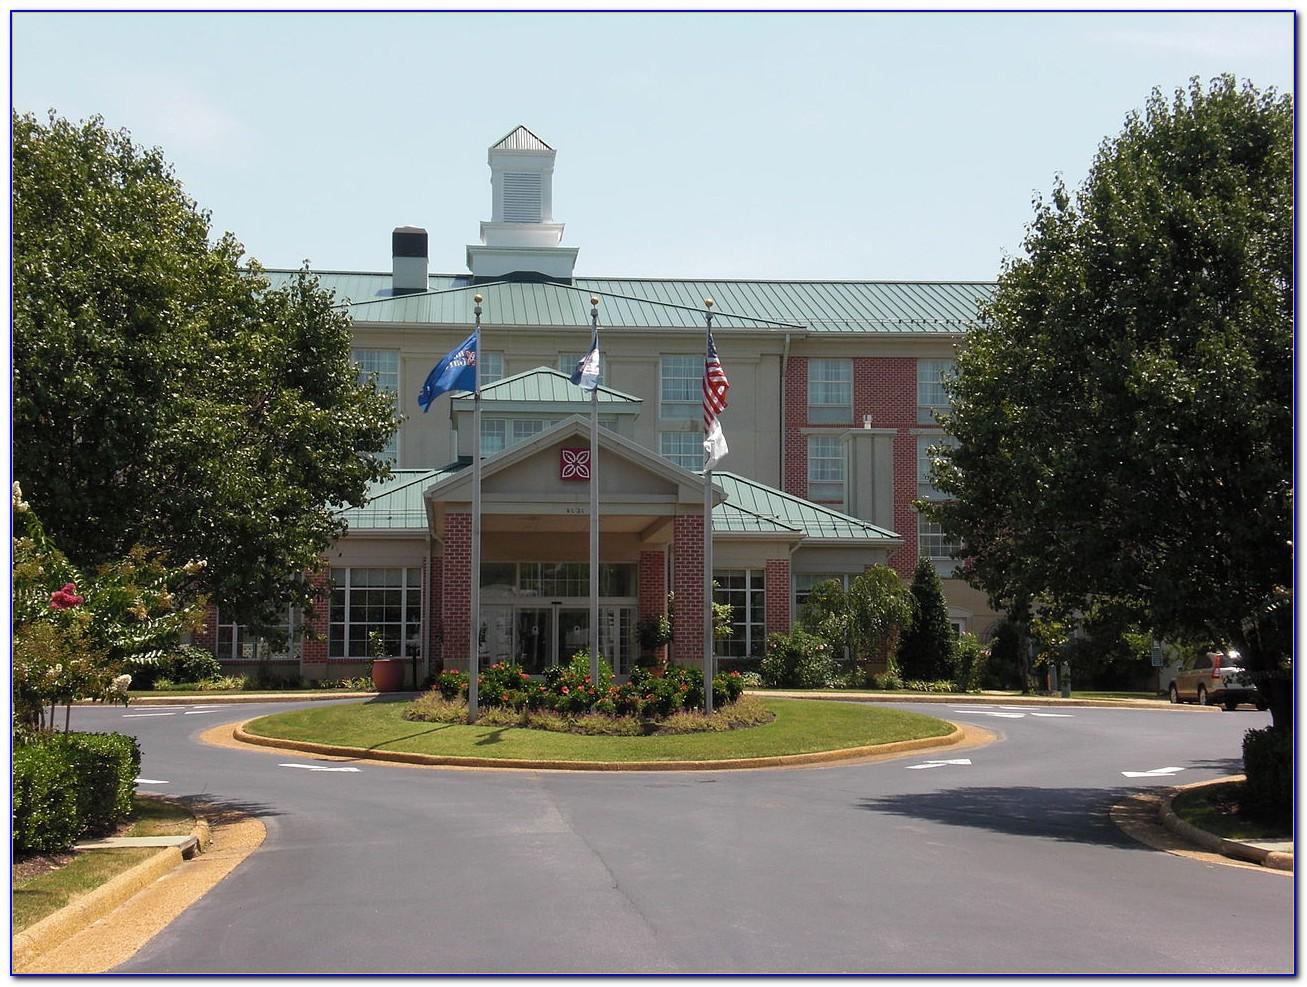 Hilton Garden Inn Williamsburg Virginia